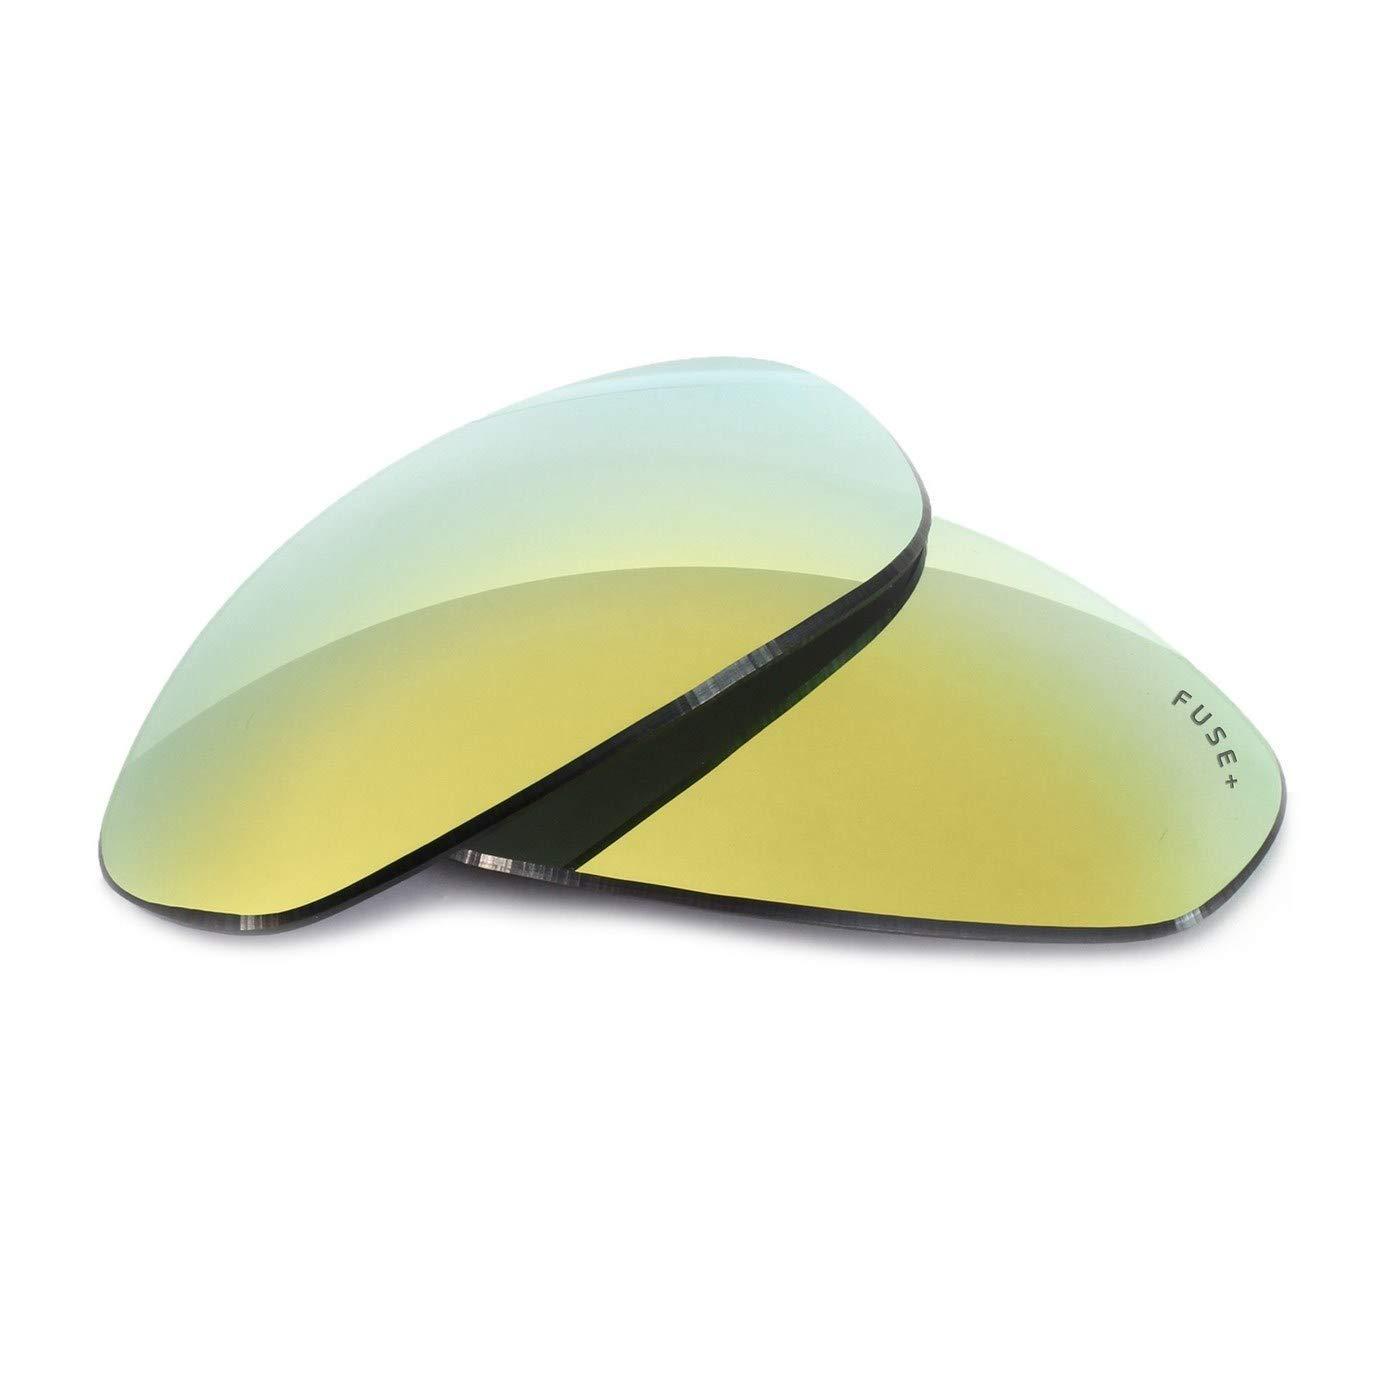 Fuse Lenses Fuse Plus Replacement Lenses for Arnette Nomad AN127